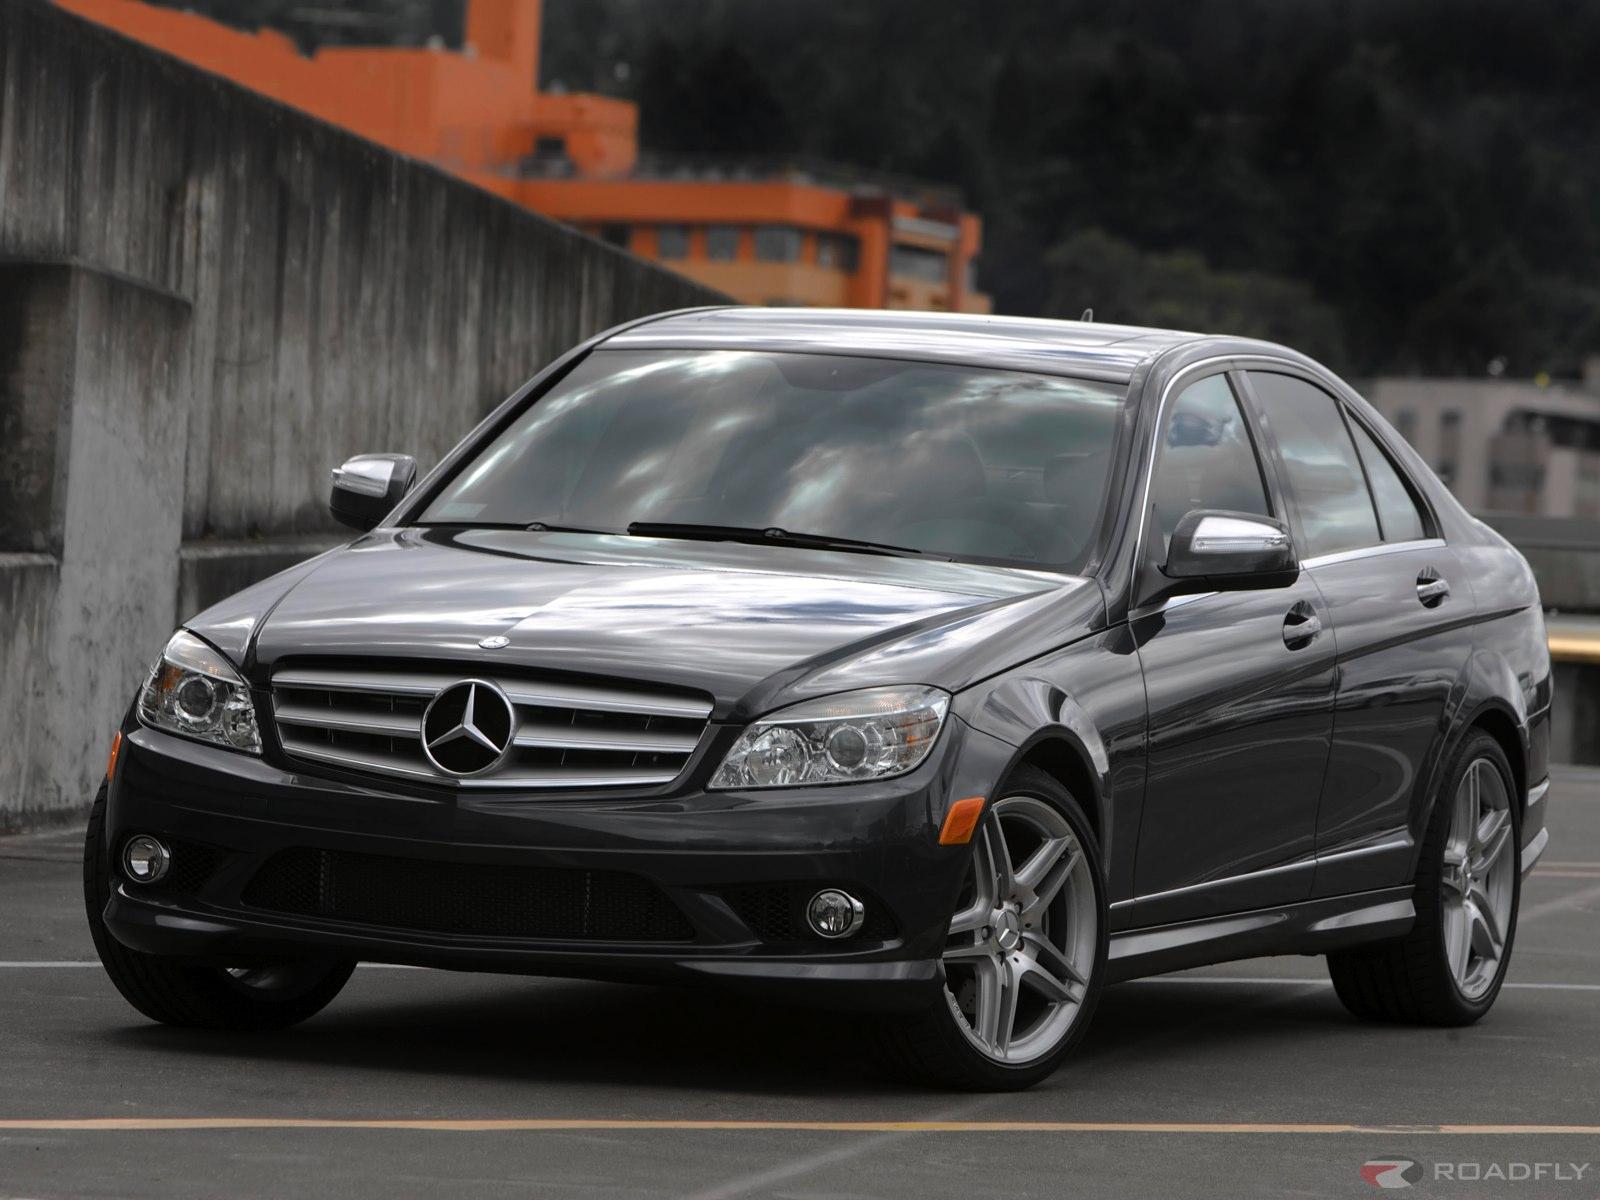 mersedes+arabalar+HEDZA+%252856%2529 Mercedes Modelleri